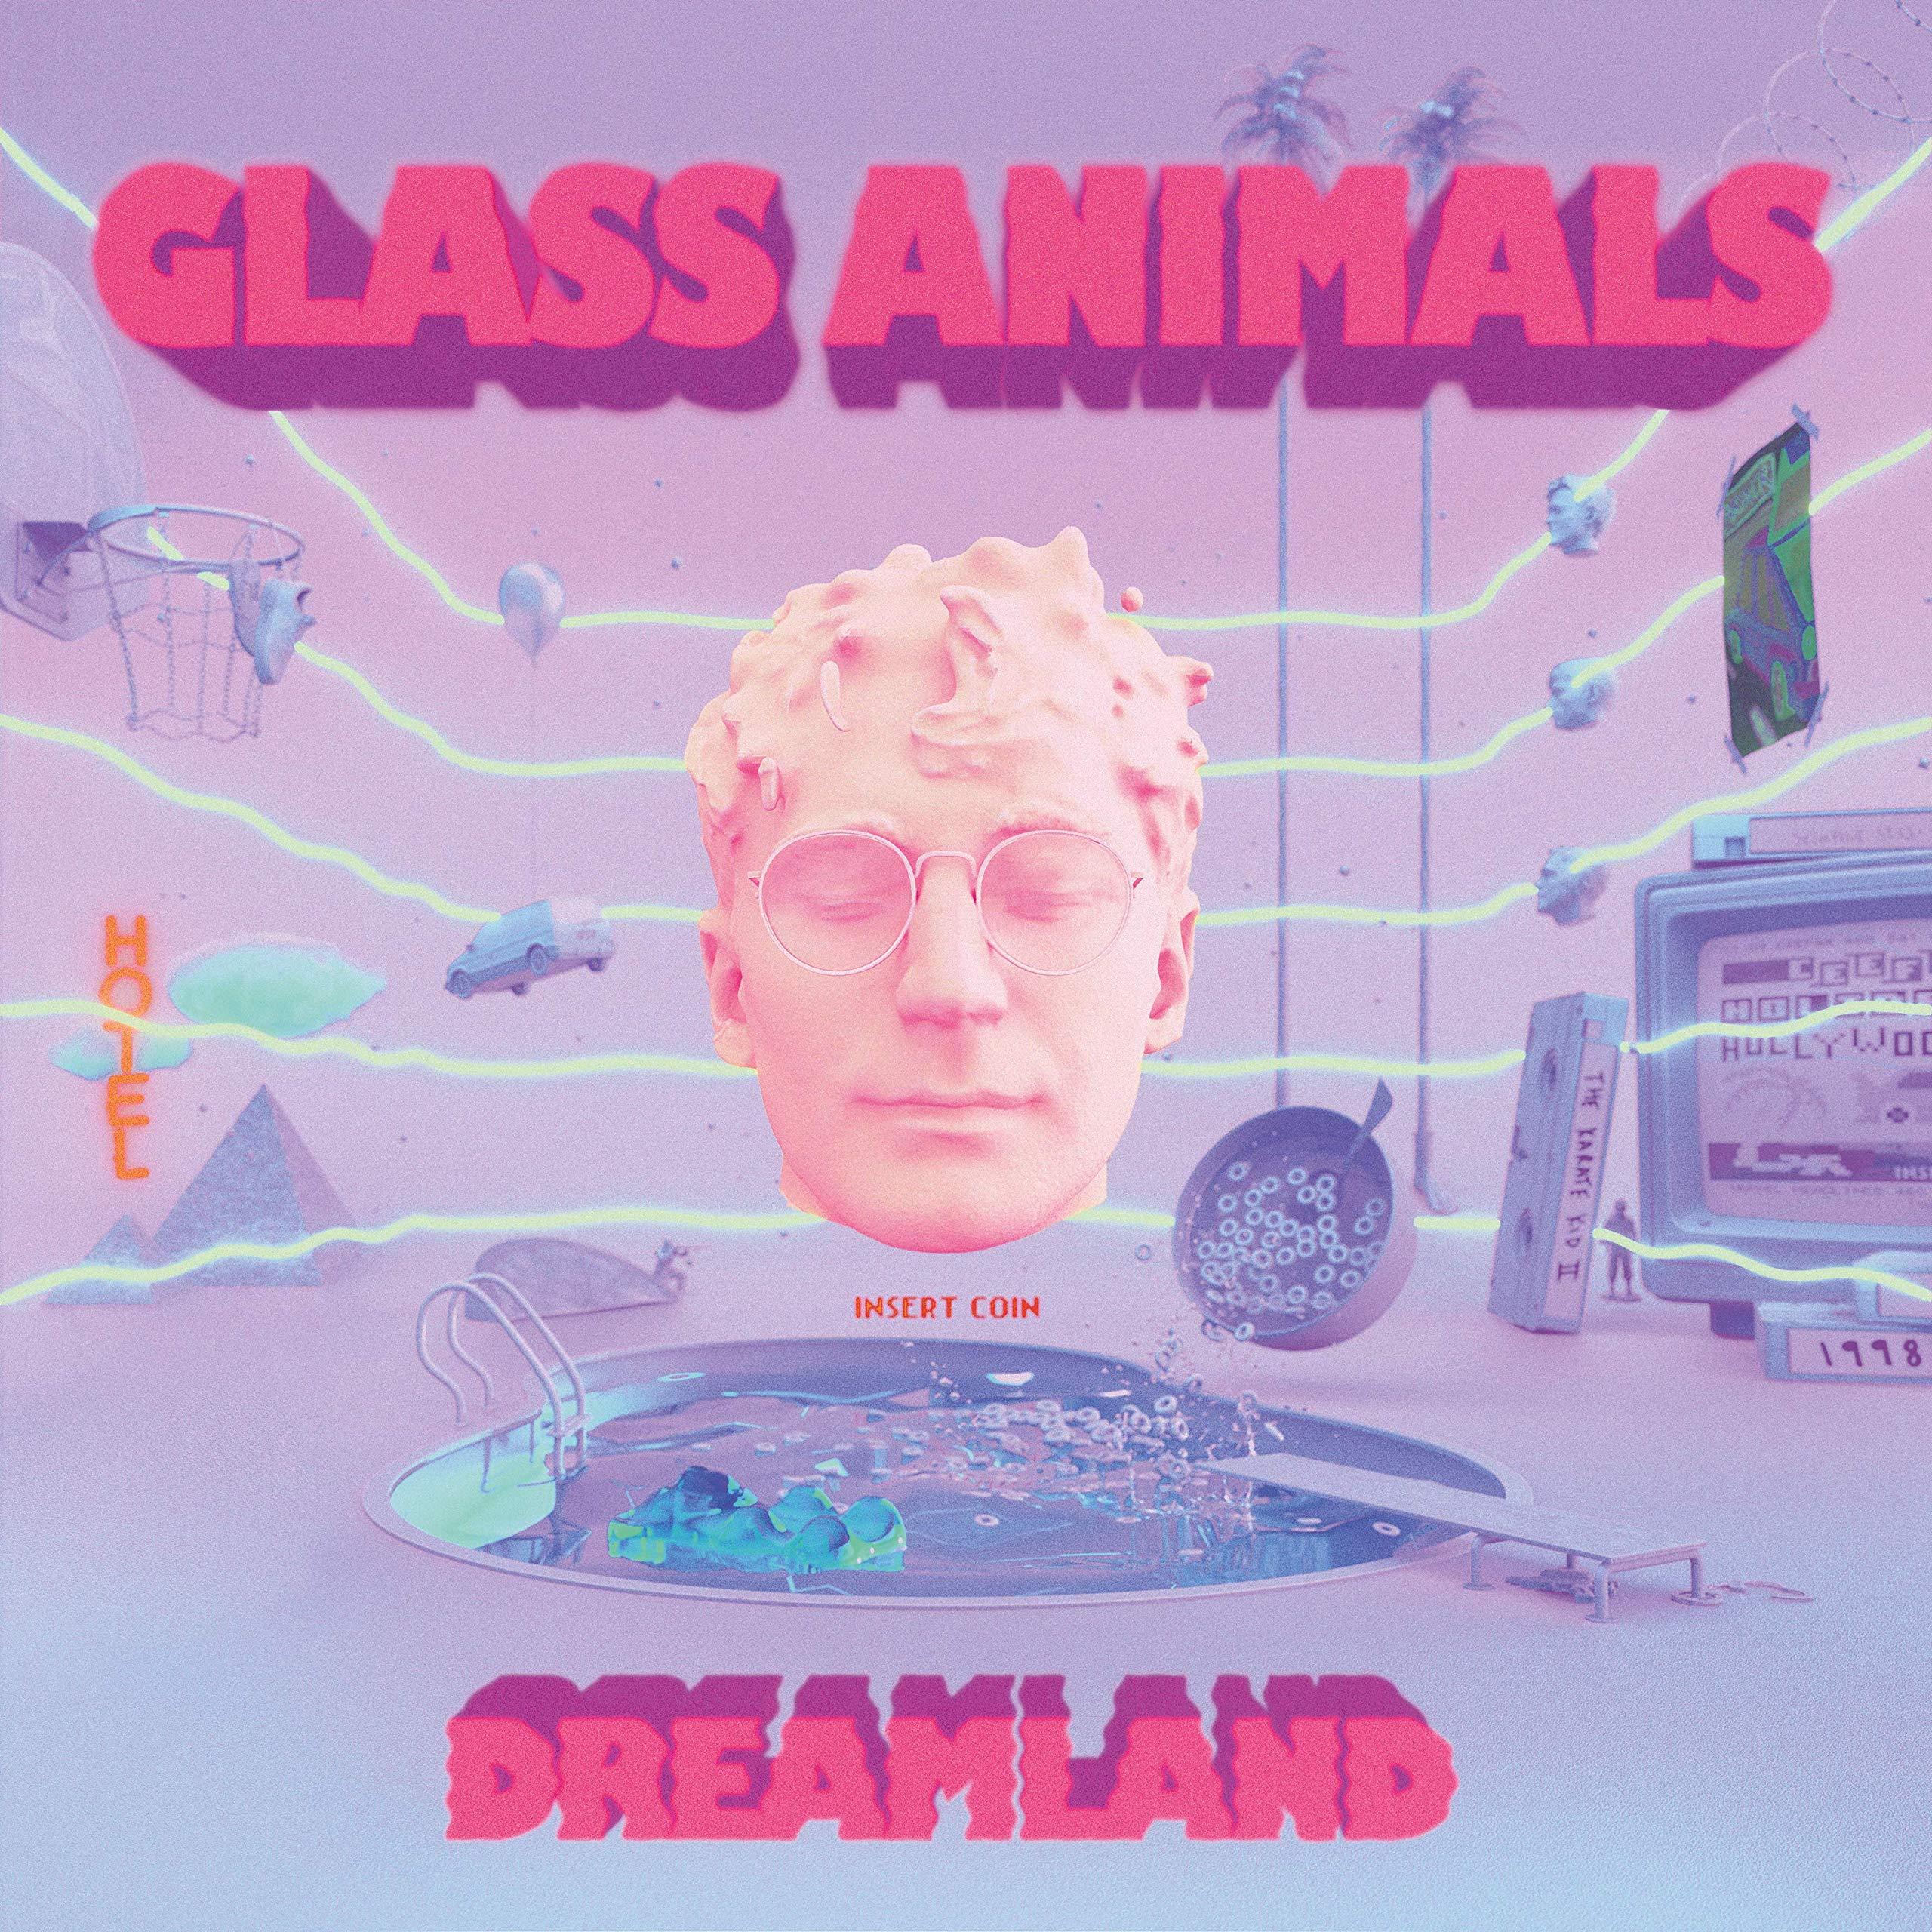 Glass Animals – Dreamland (2020) [FLAC]